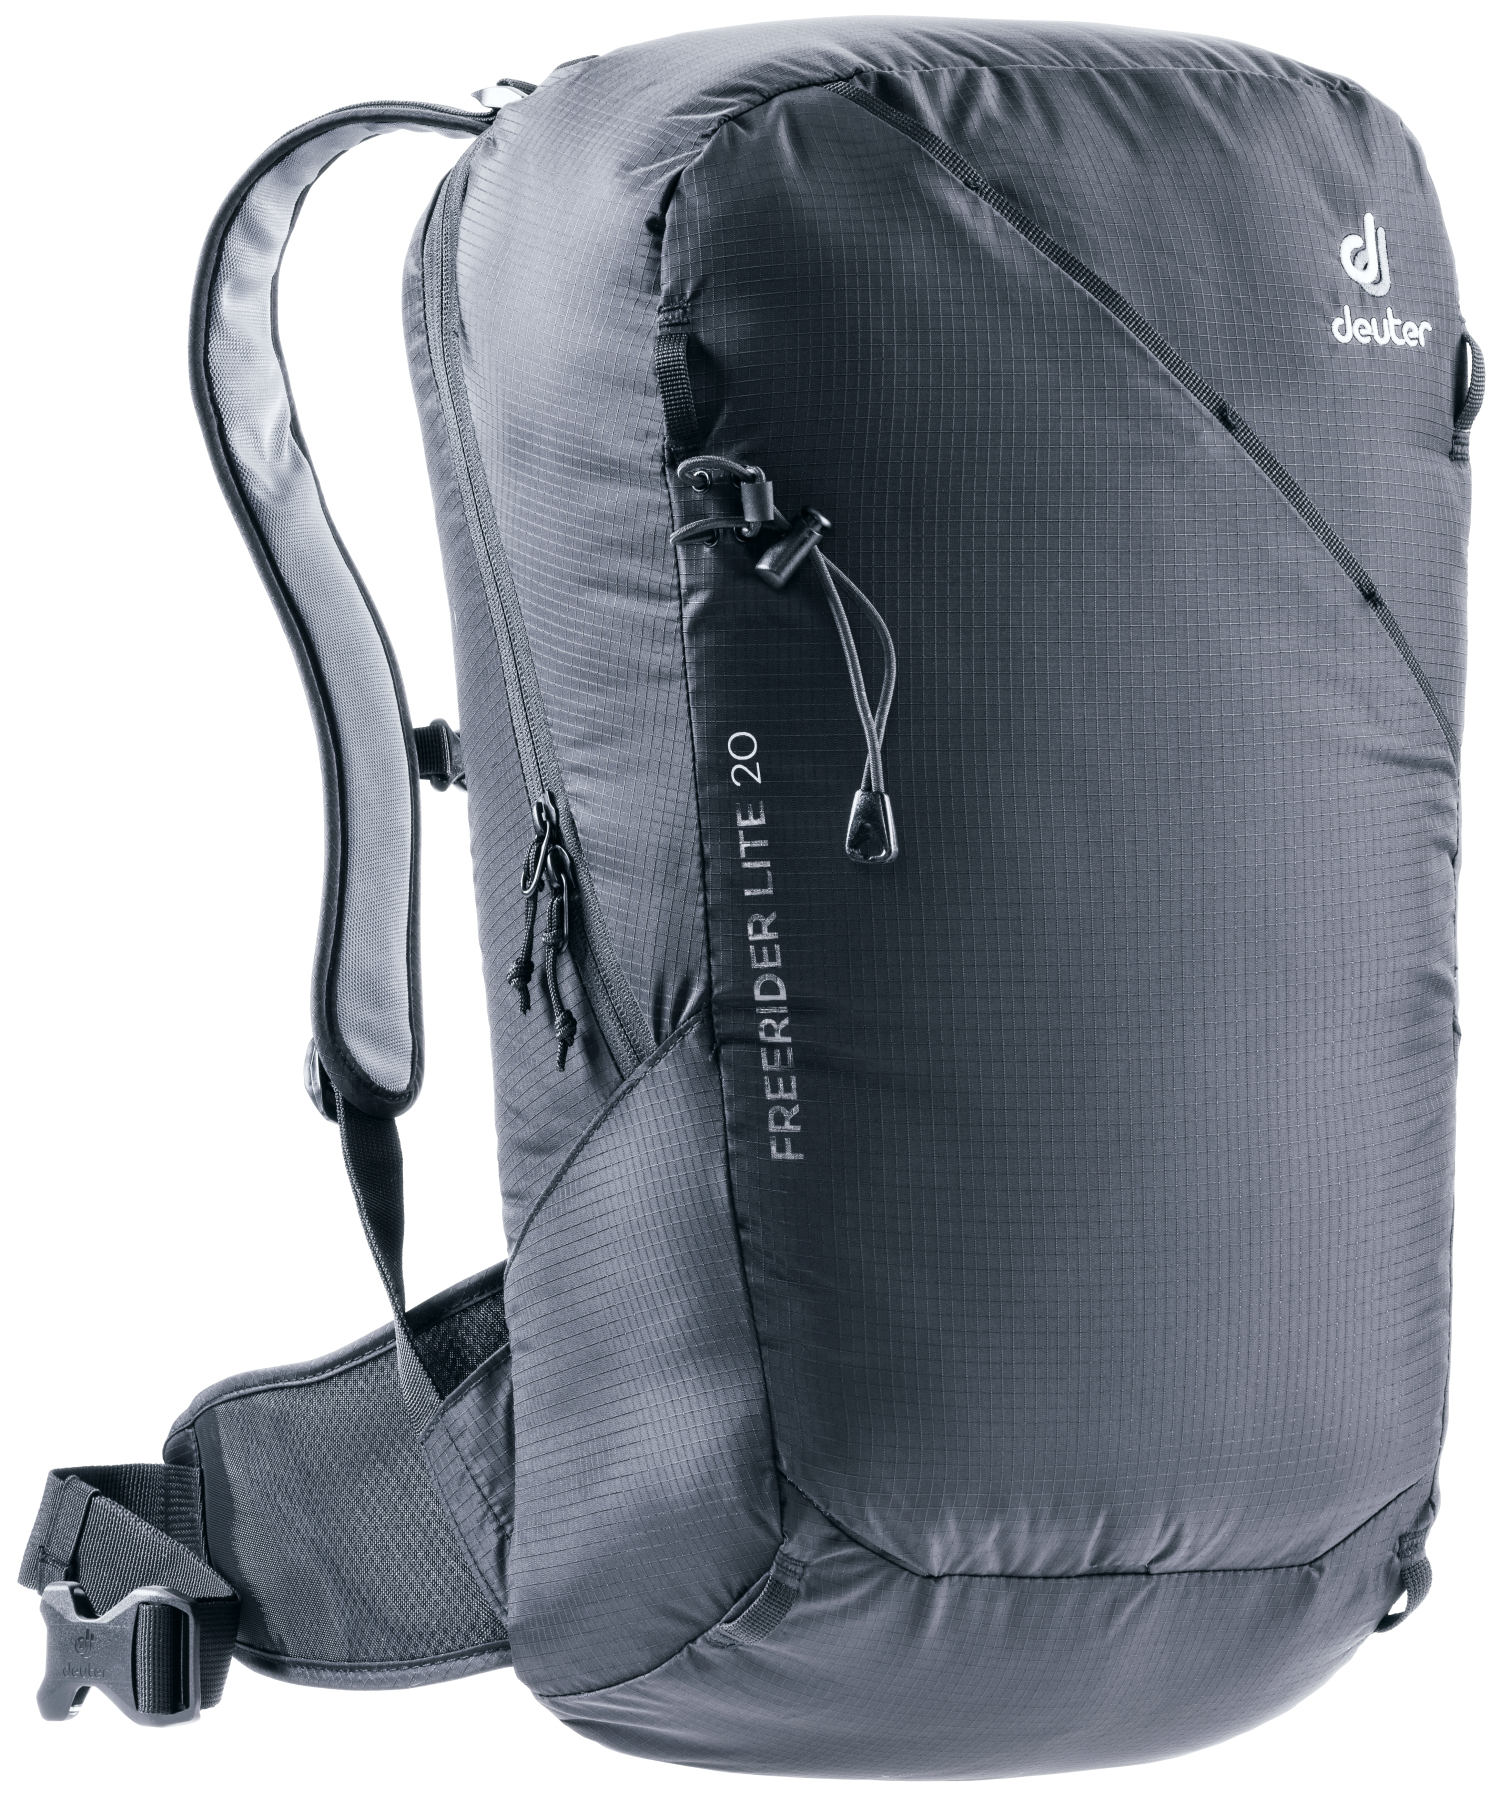 Зимние рюкзаки Рюкзак сноубордический Deuter Freerider Lite 20 3303121-7000-FreeriderLite20-w20-d0.jpg